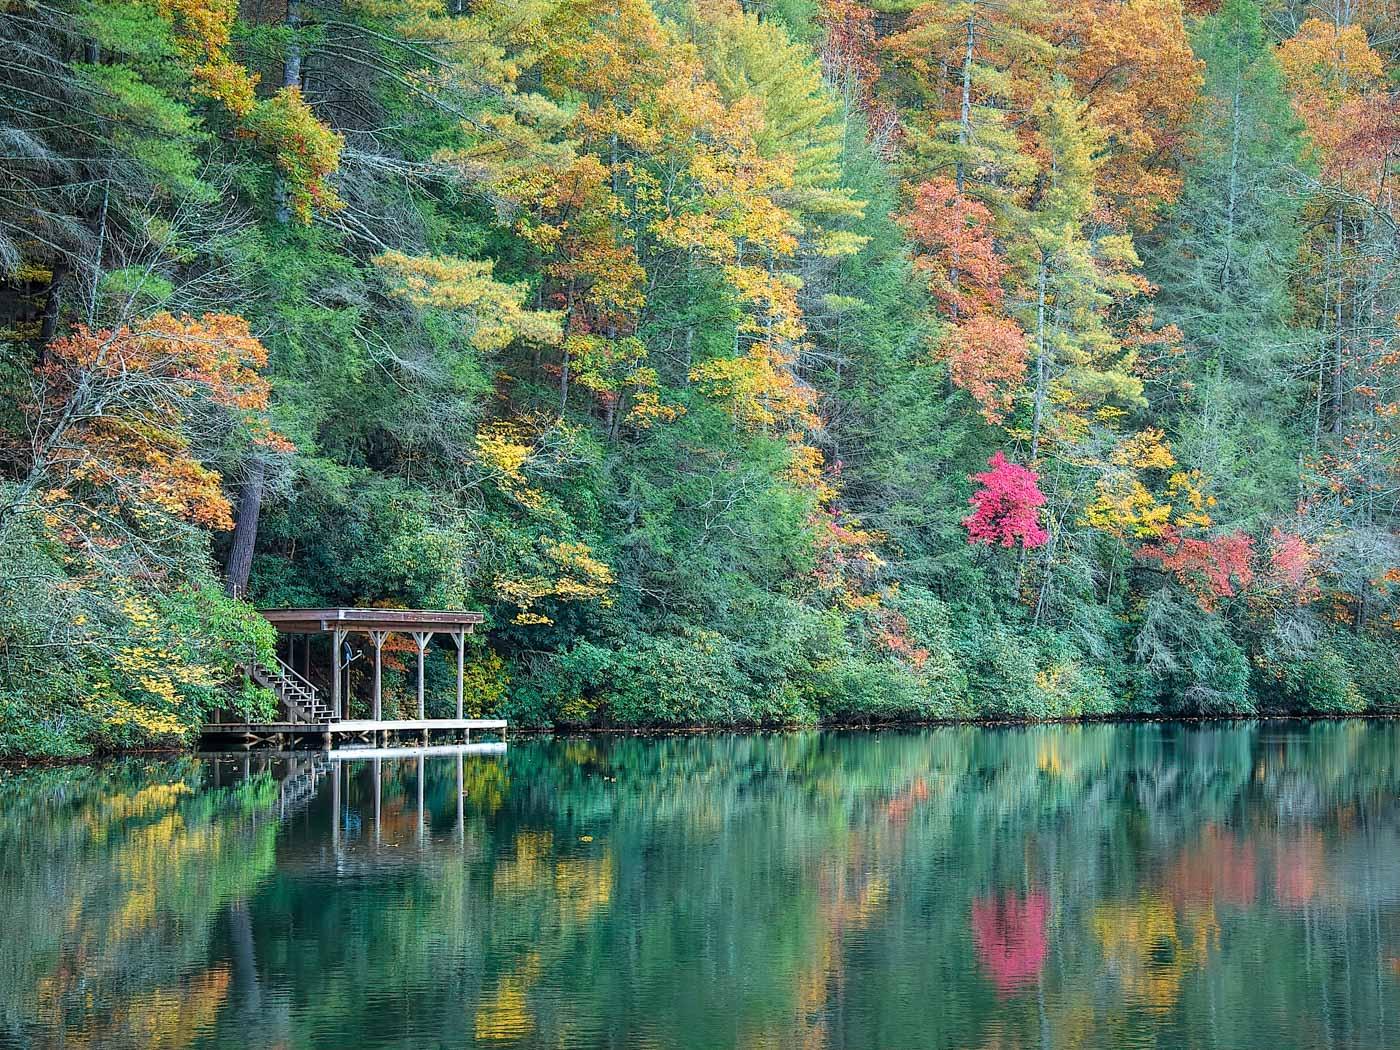 Green Reflections, Lake Seed